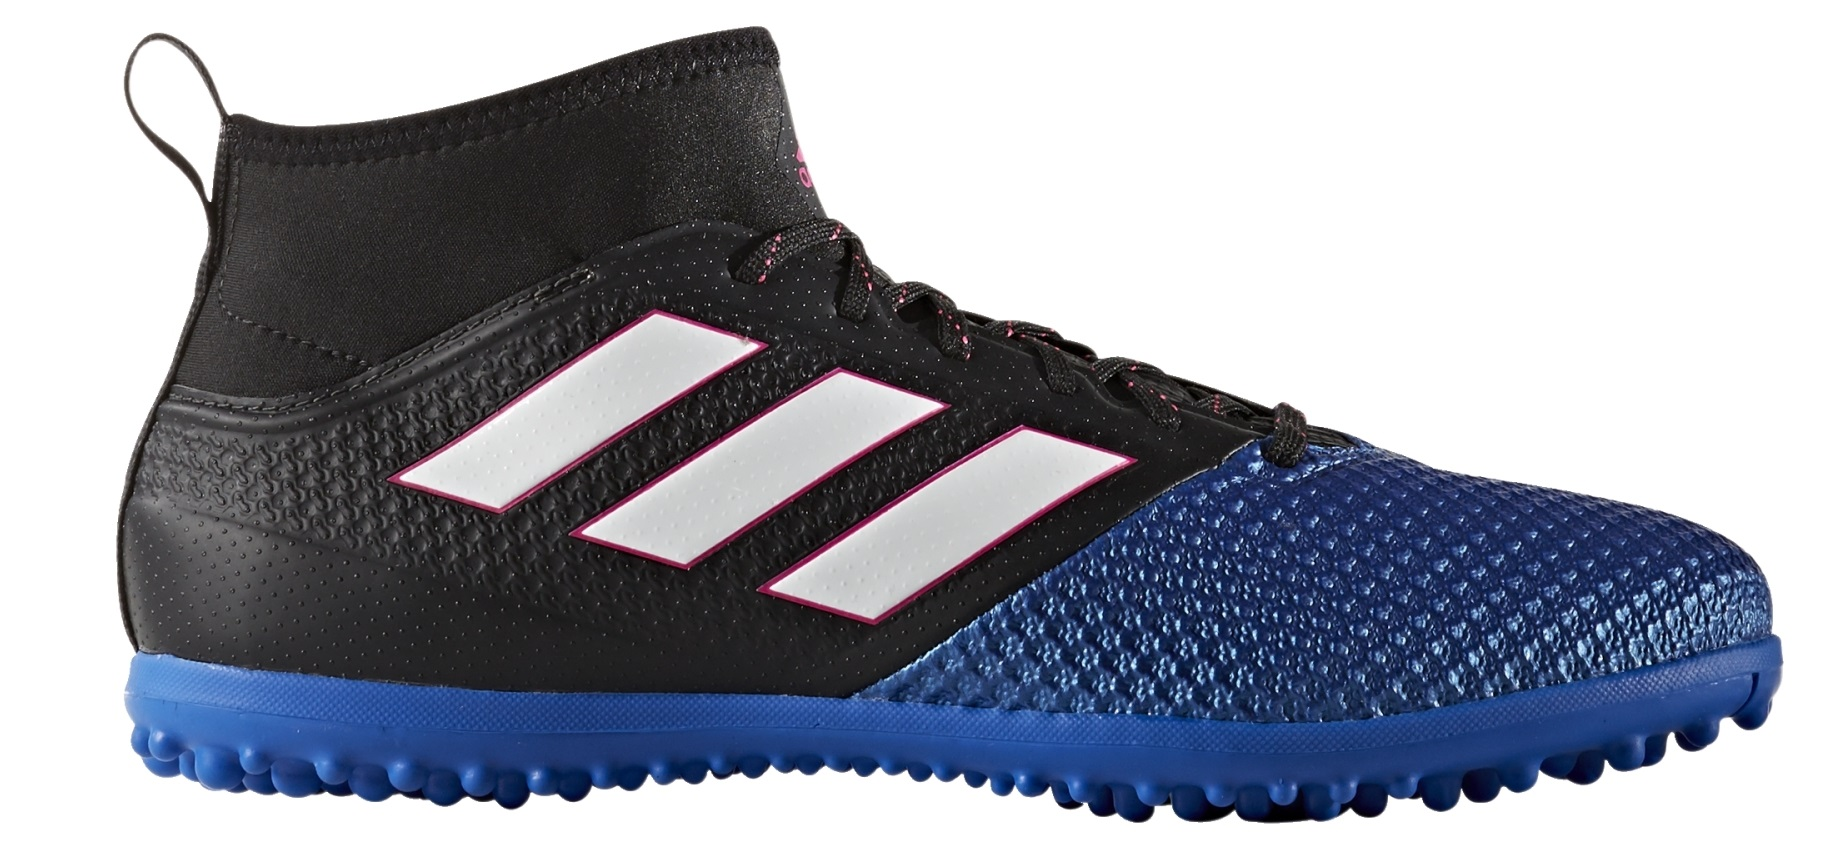 finest selection 678ea a6e52 Adidas Football boots Ace 17.3 PrimeMesh TF Blue Blast Pack